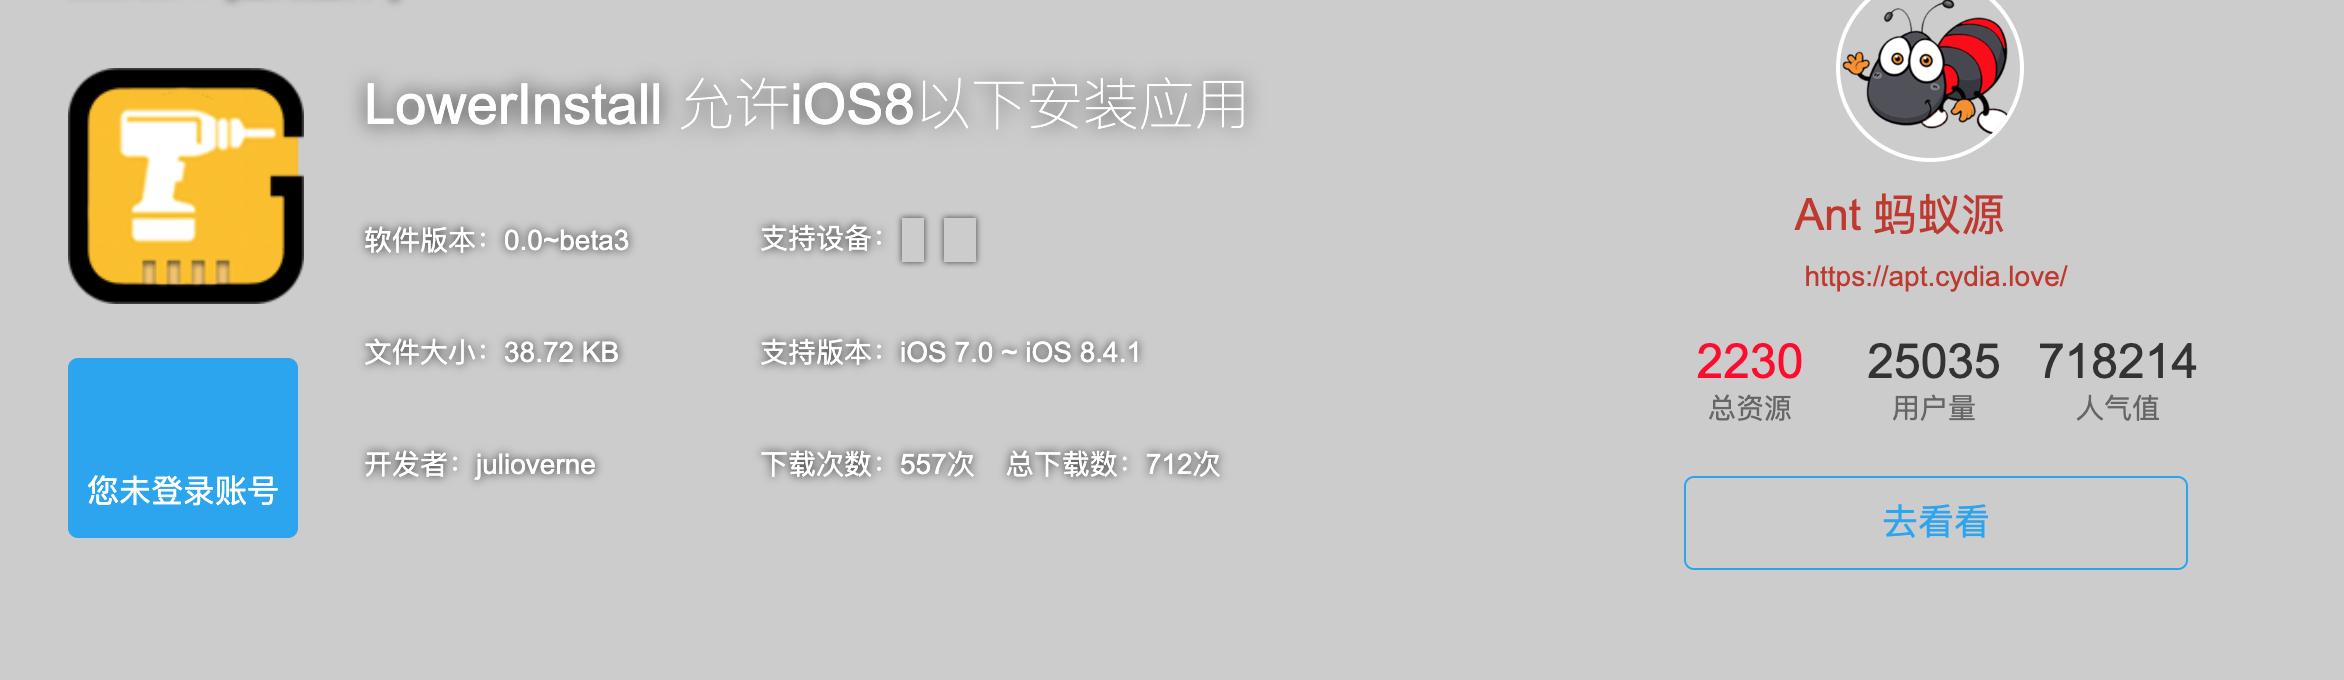 屏幕快照 2019-09-24 下午1.57.53.png